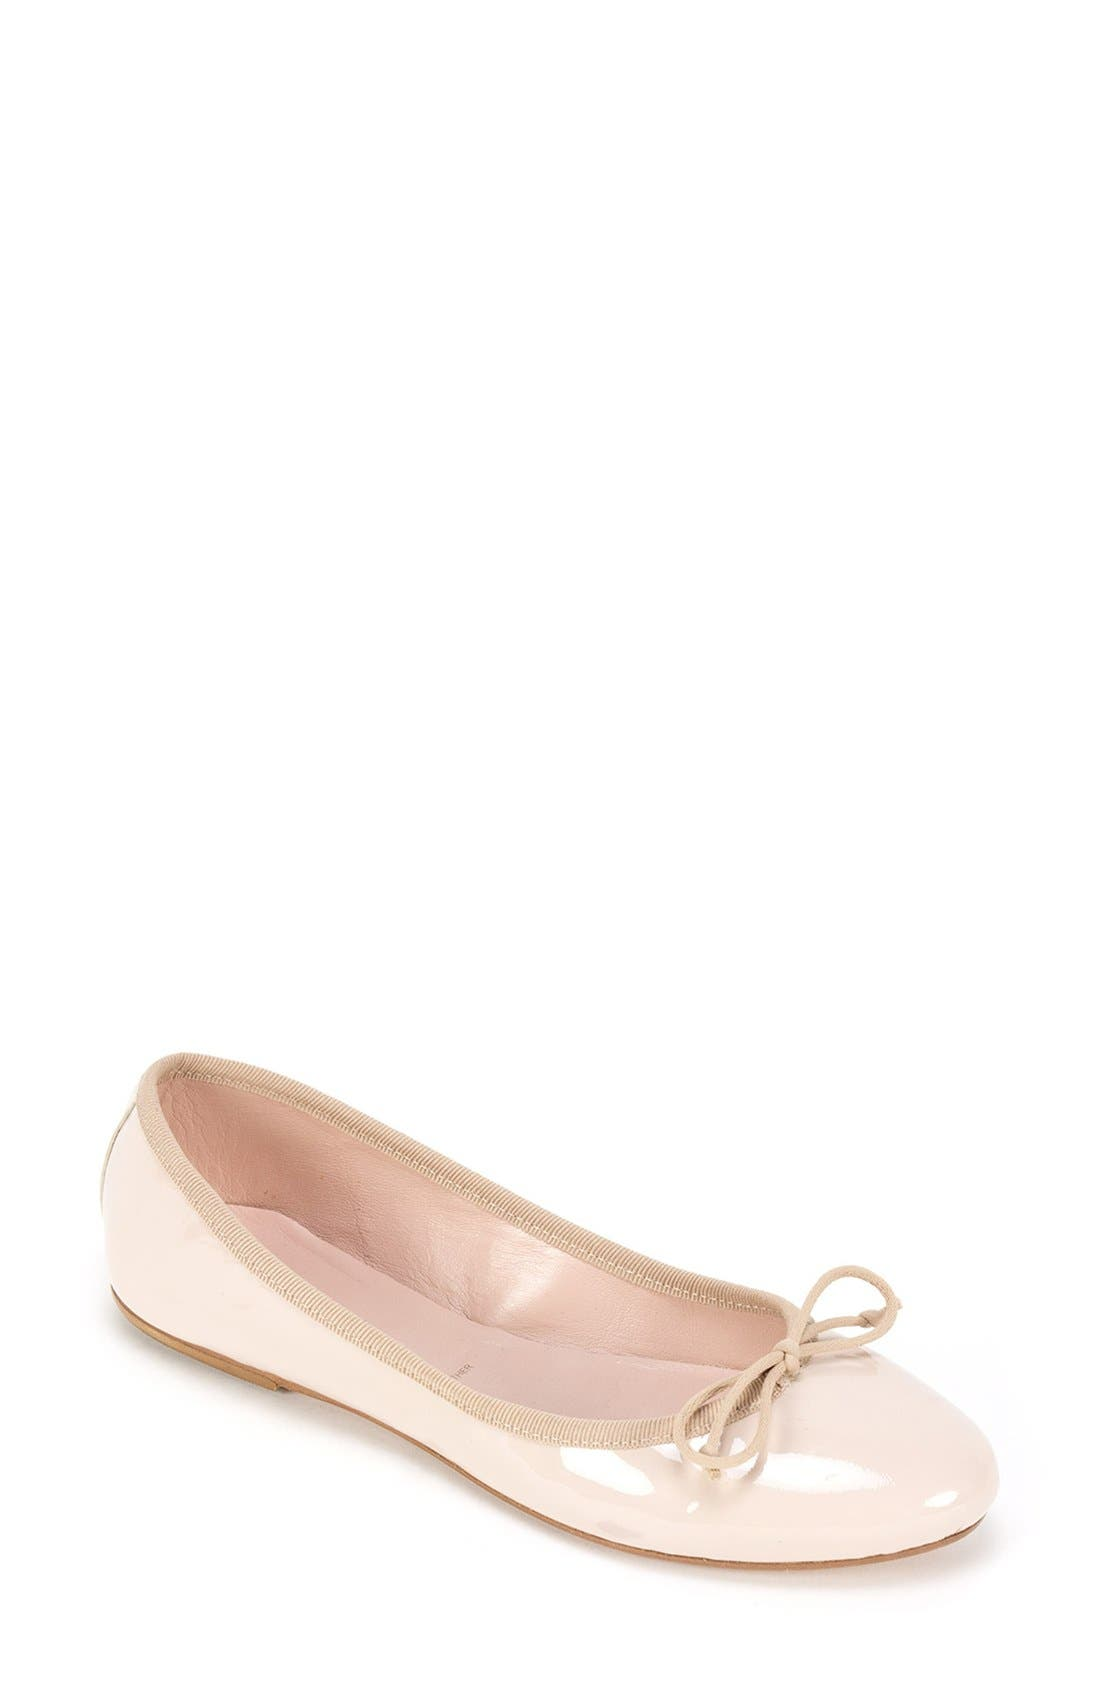 Summit 'Kendall' Ballet Flat,                             Main thumbnail 1, color,